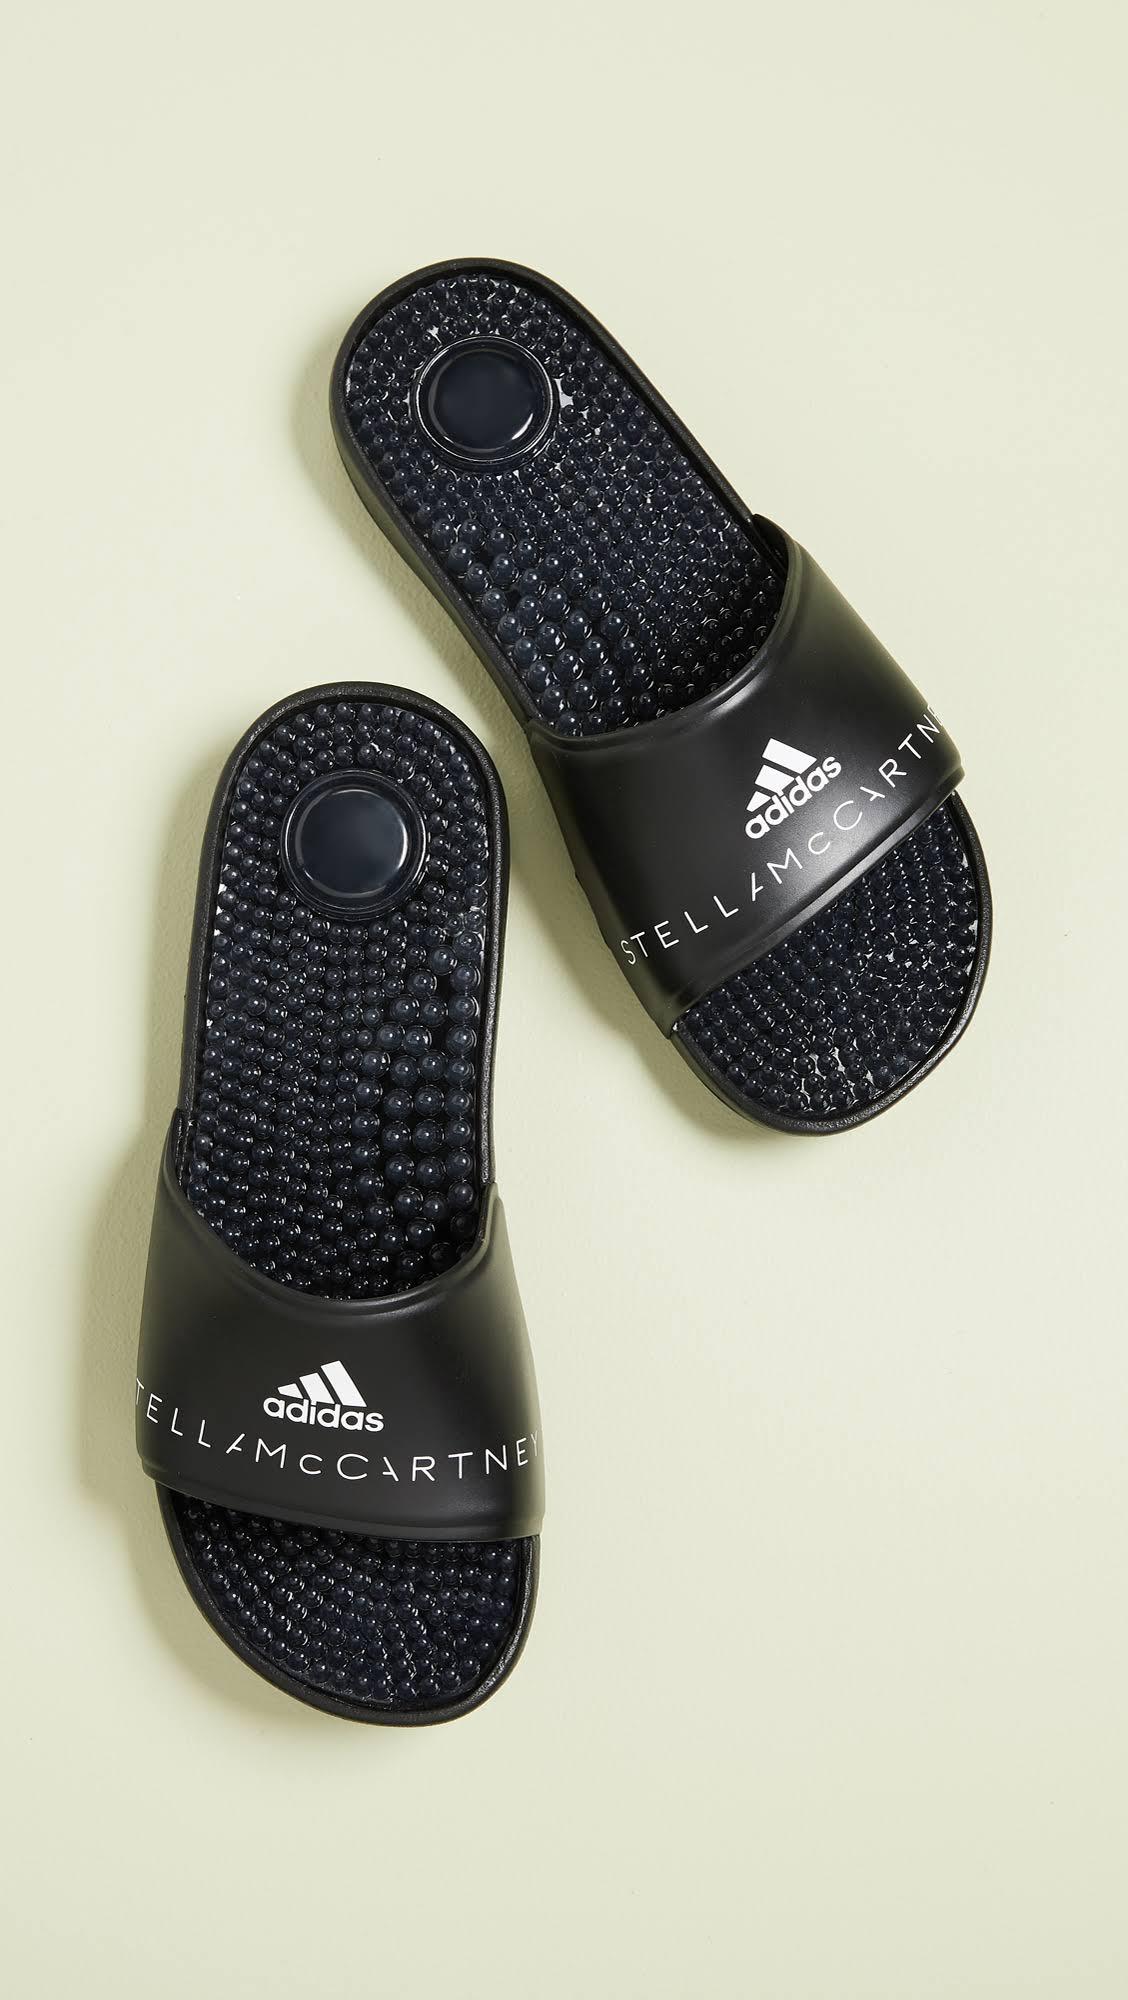 Stella Mccartney By White Black Slides W Adissage Adidas 9 1EqnxwA51